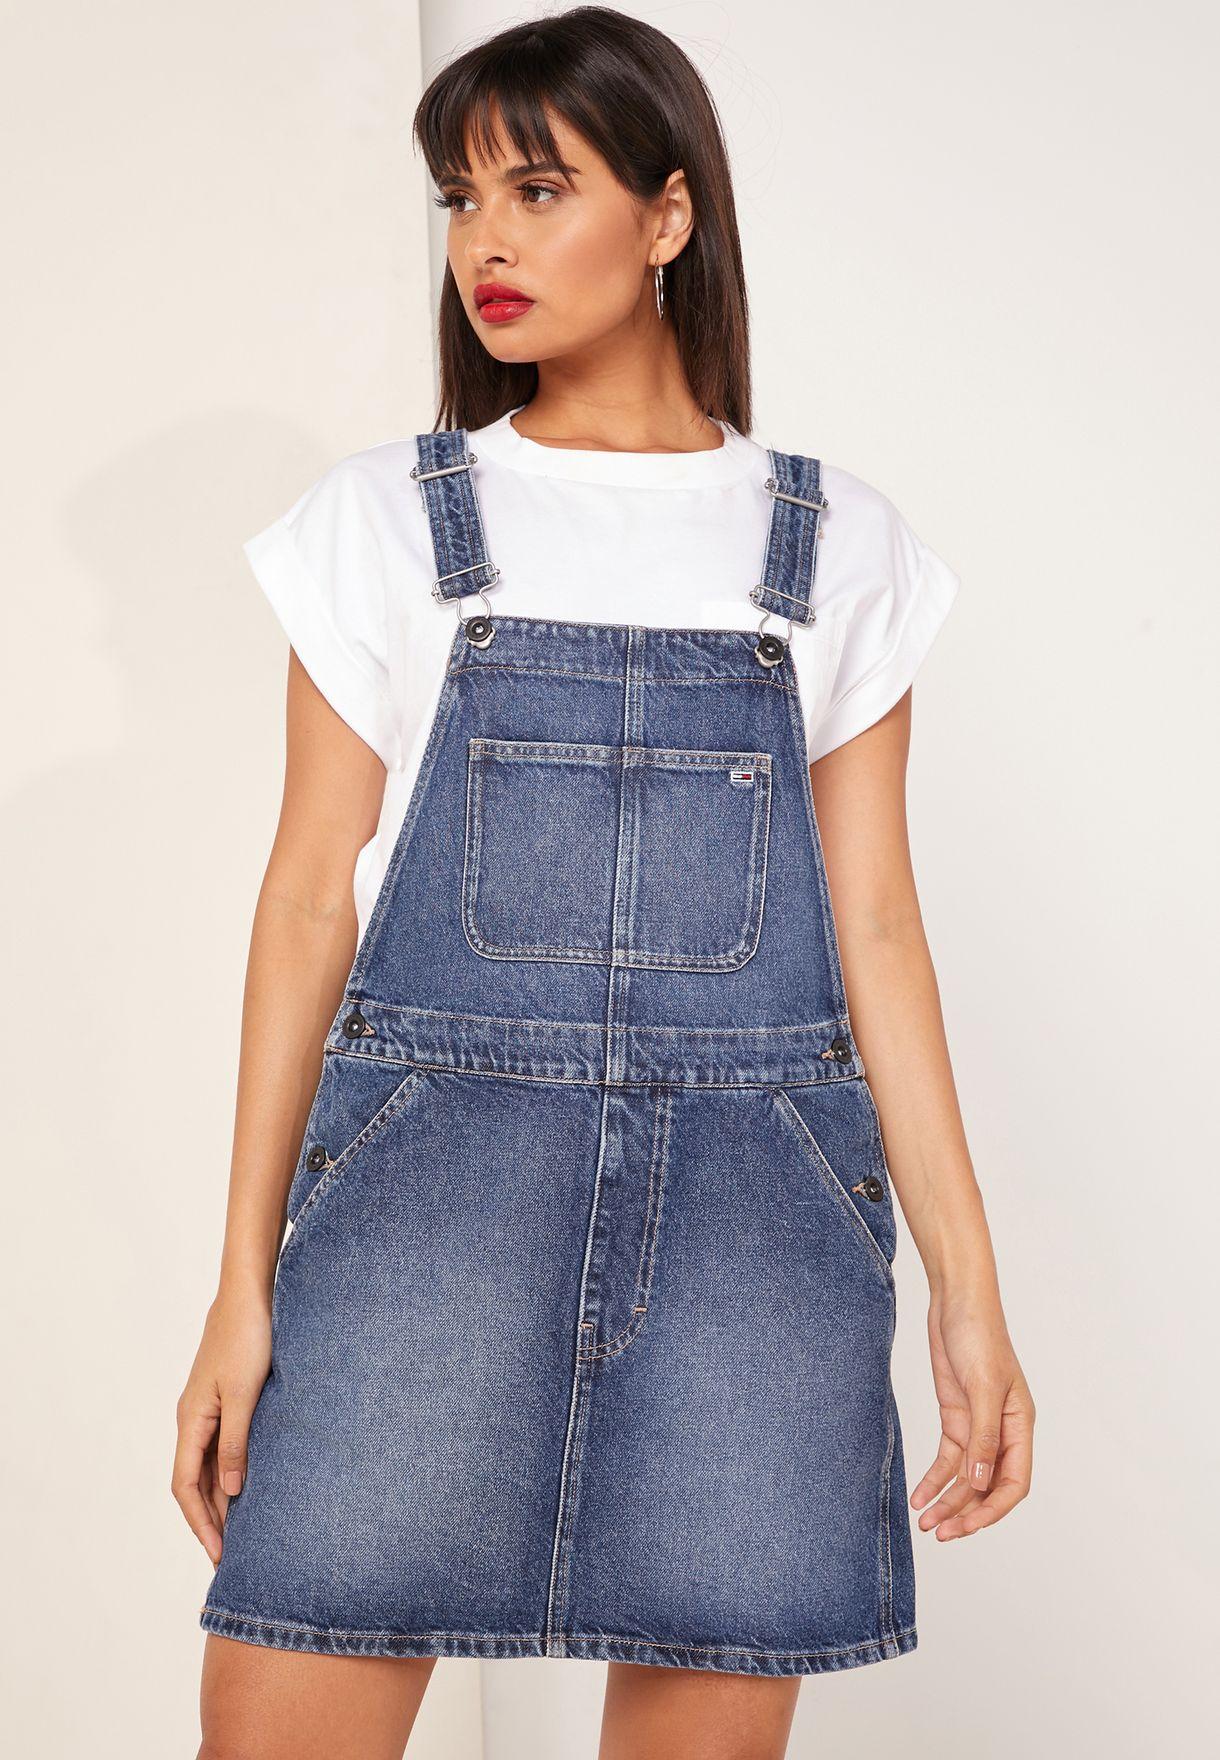 فستان جينز بلا اكمام